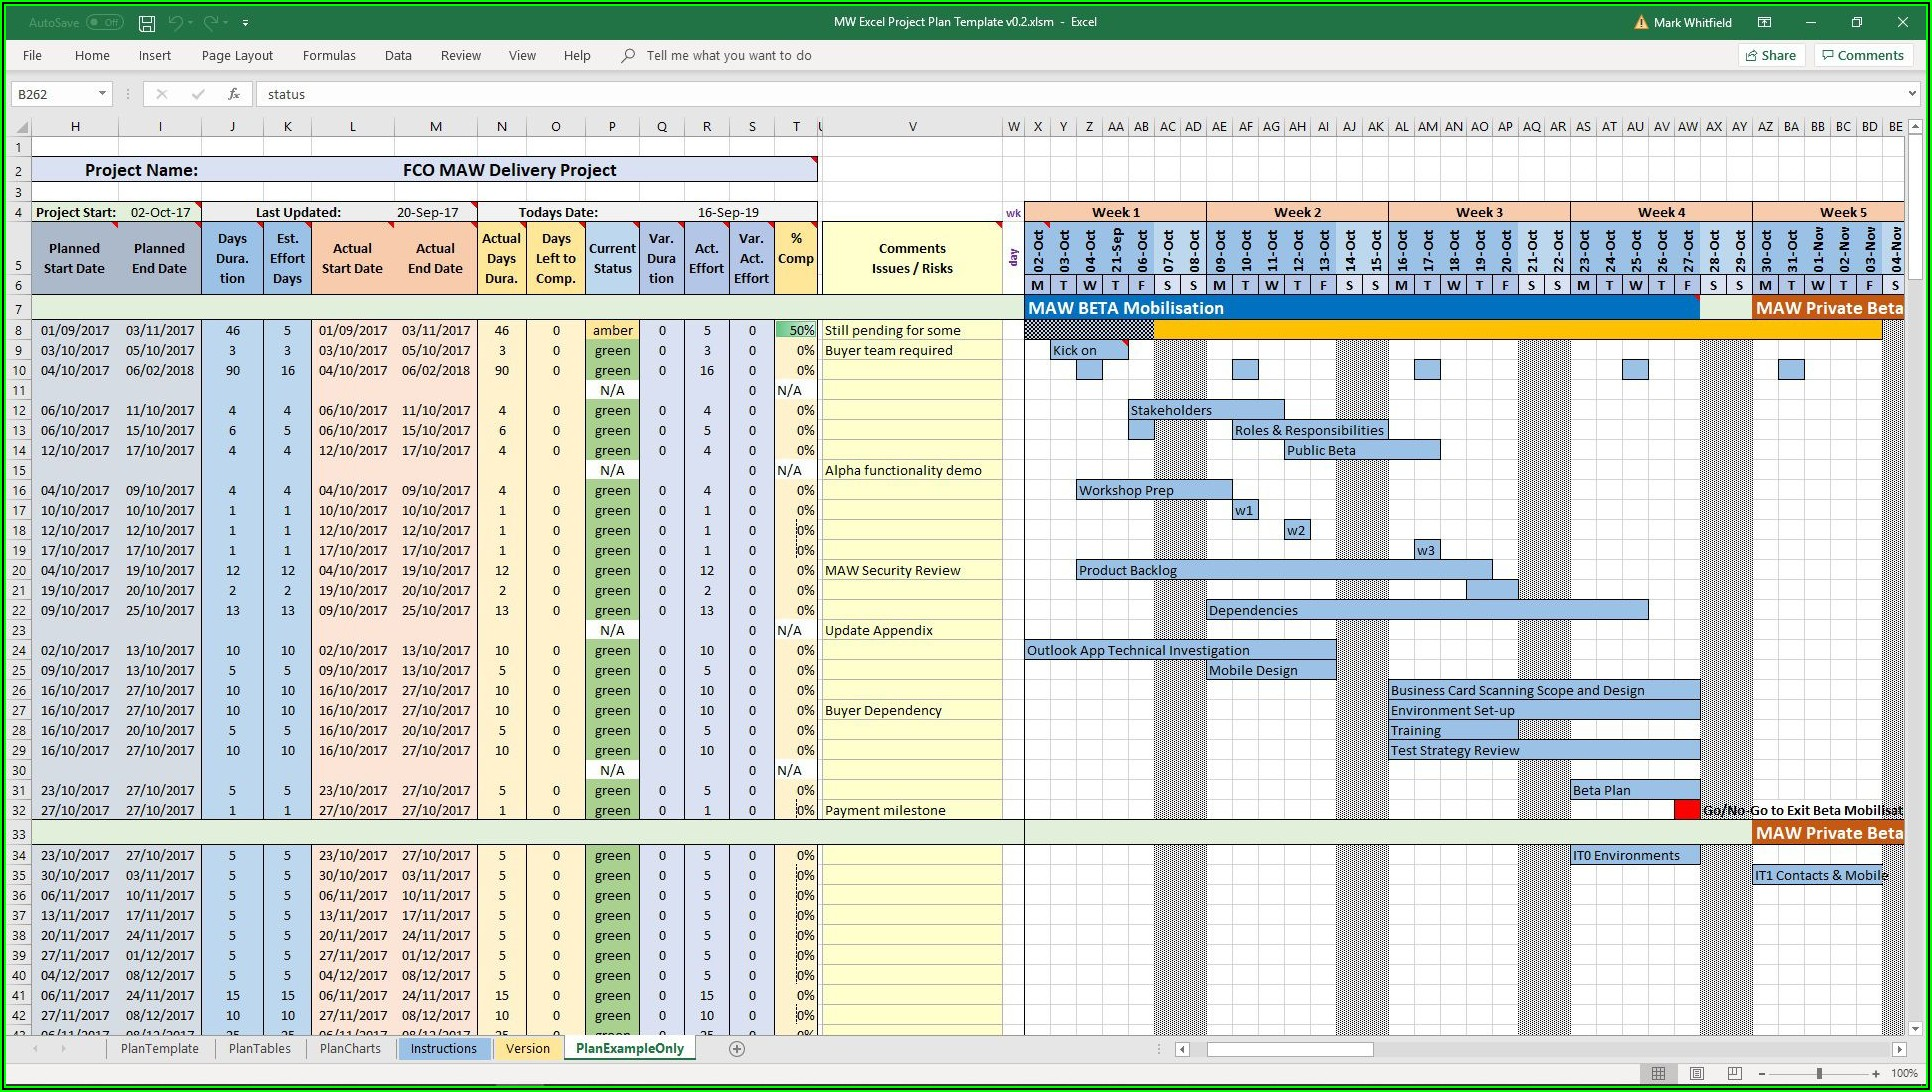 Project Management Timeline Template Excel